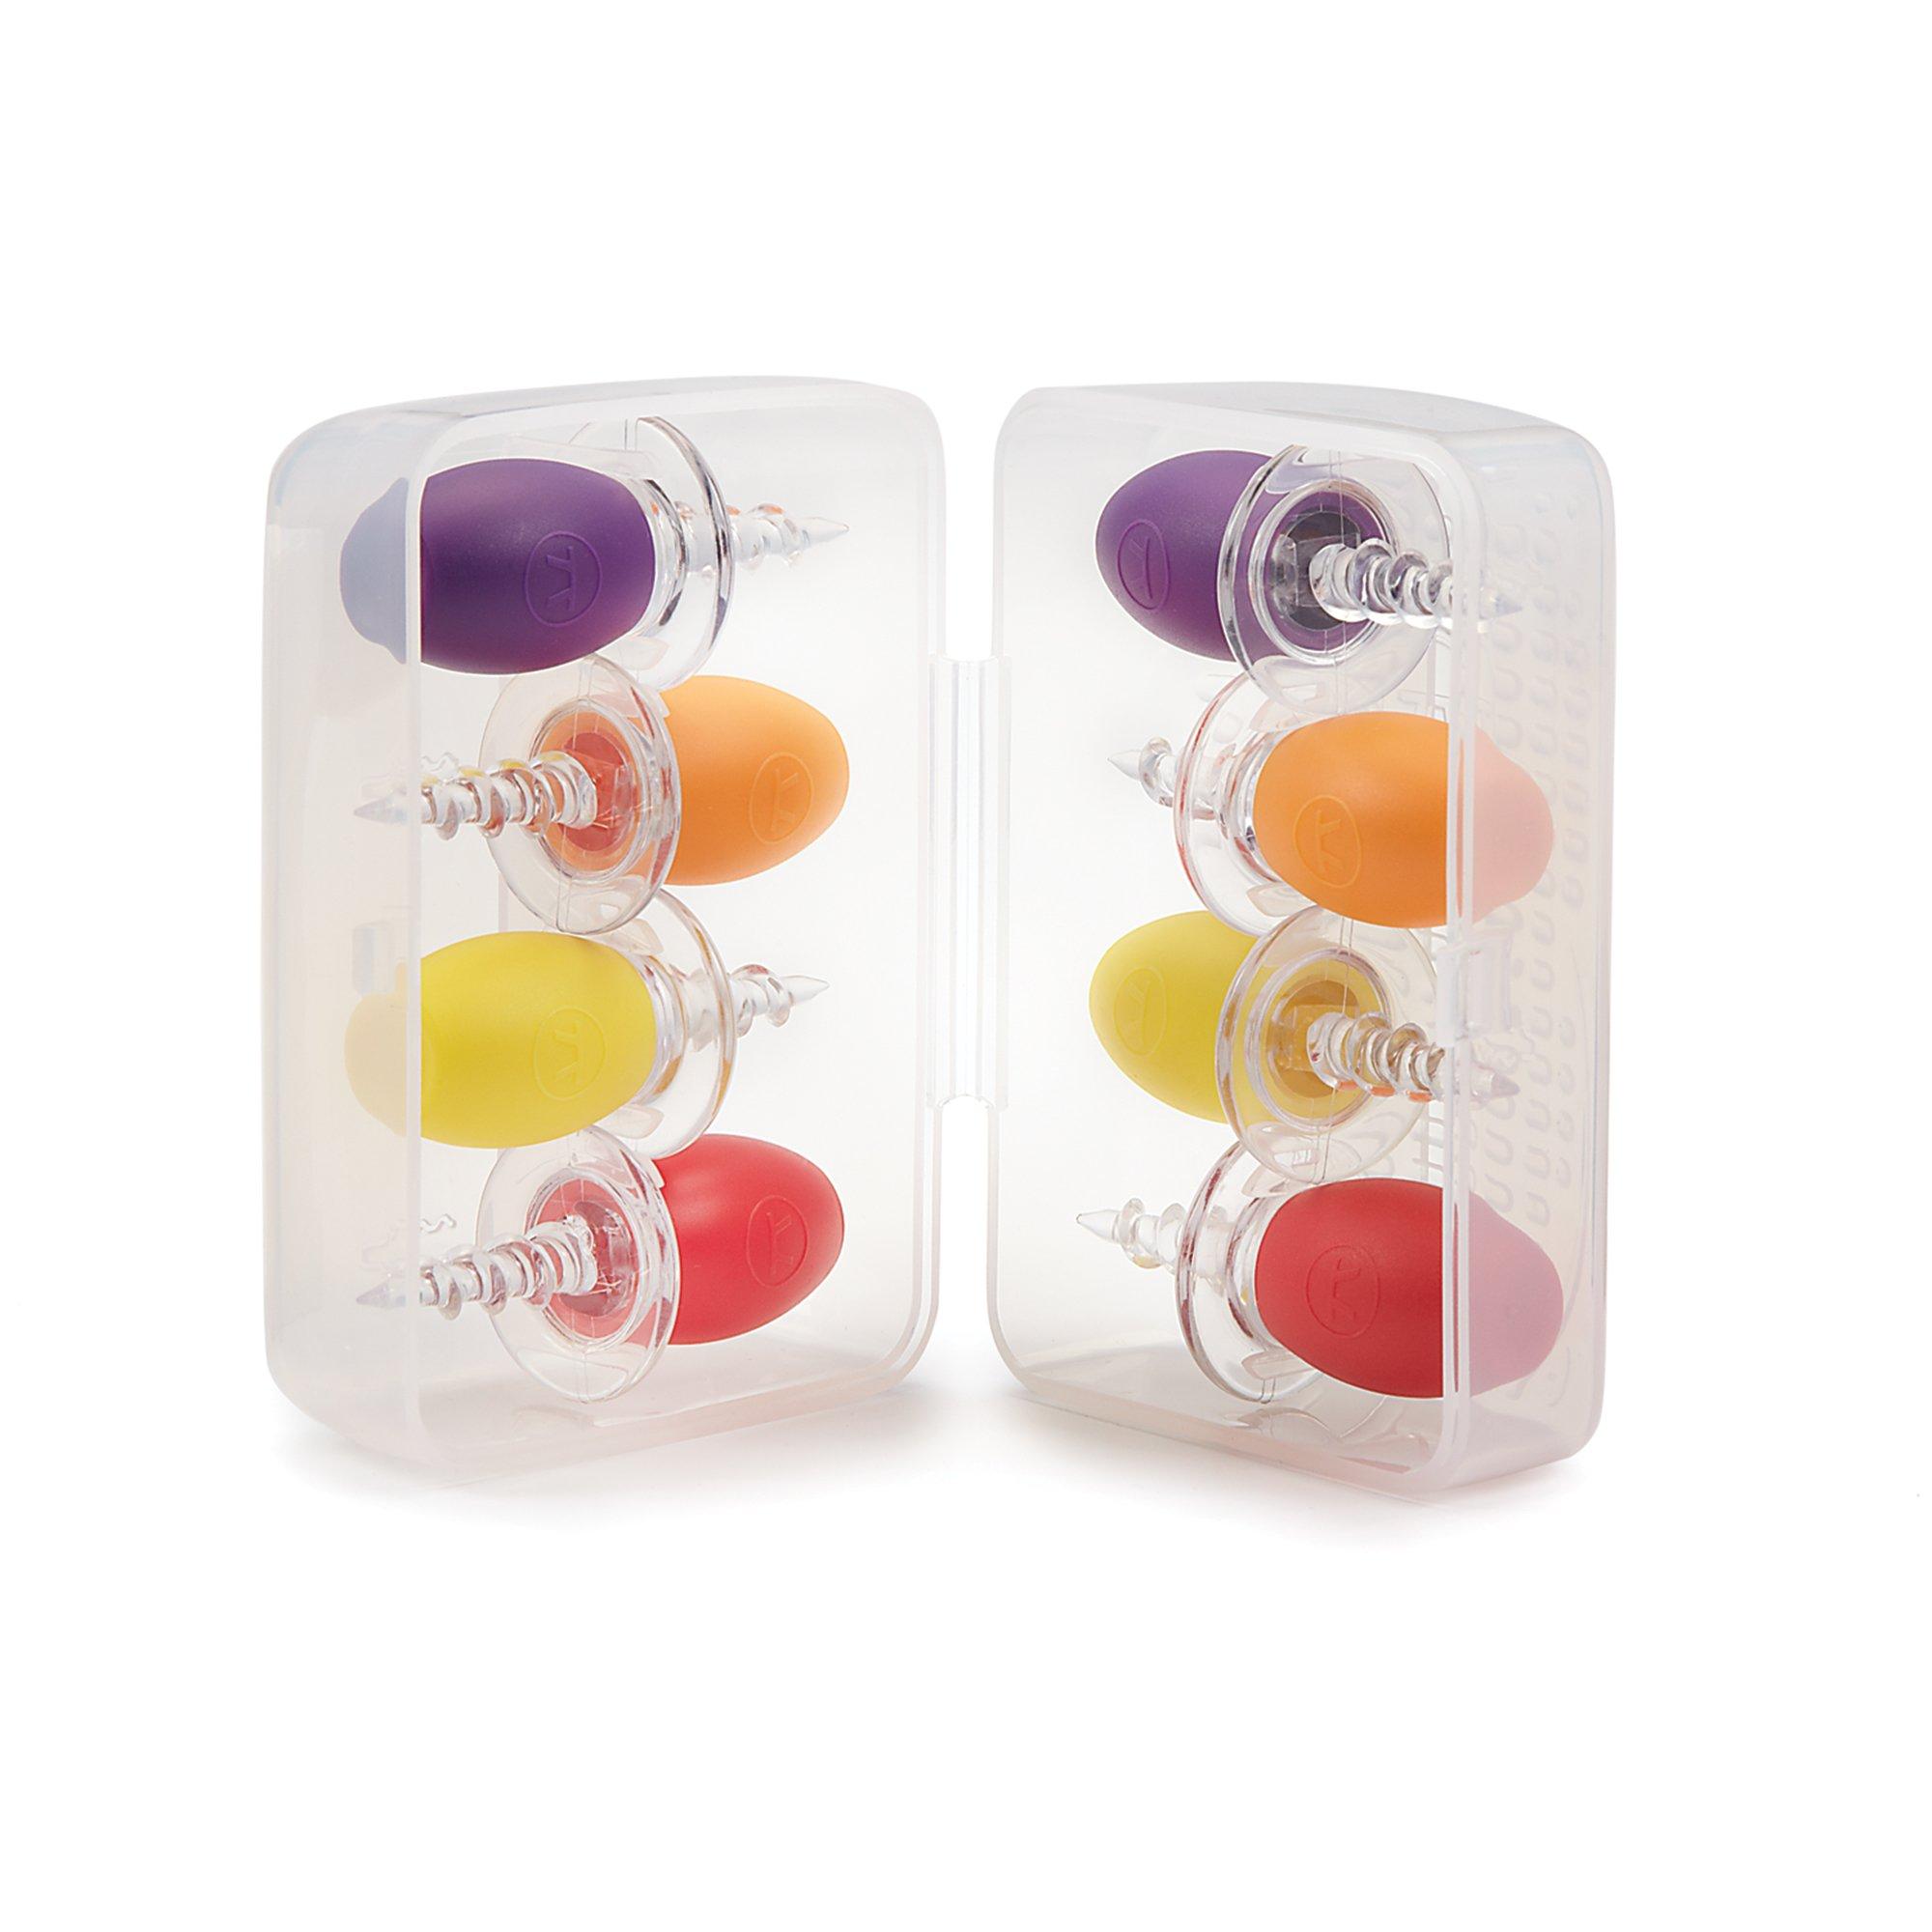 Outset F129 Corn Crib Corn Holders, Set of 8, Assorted Colors